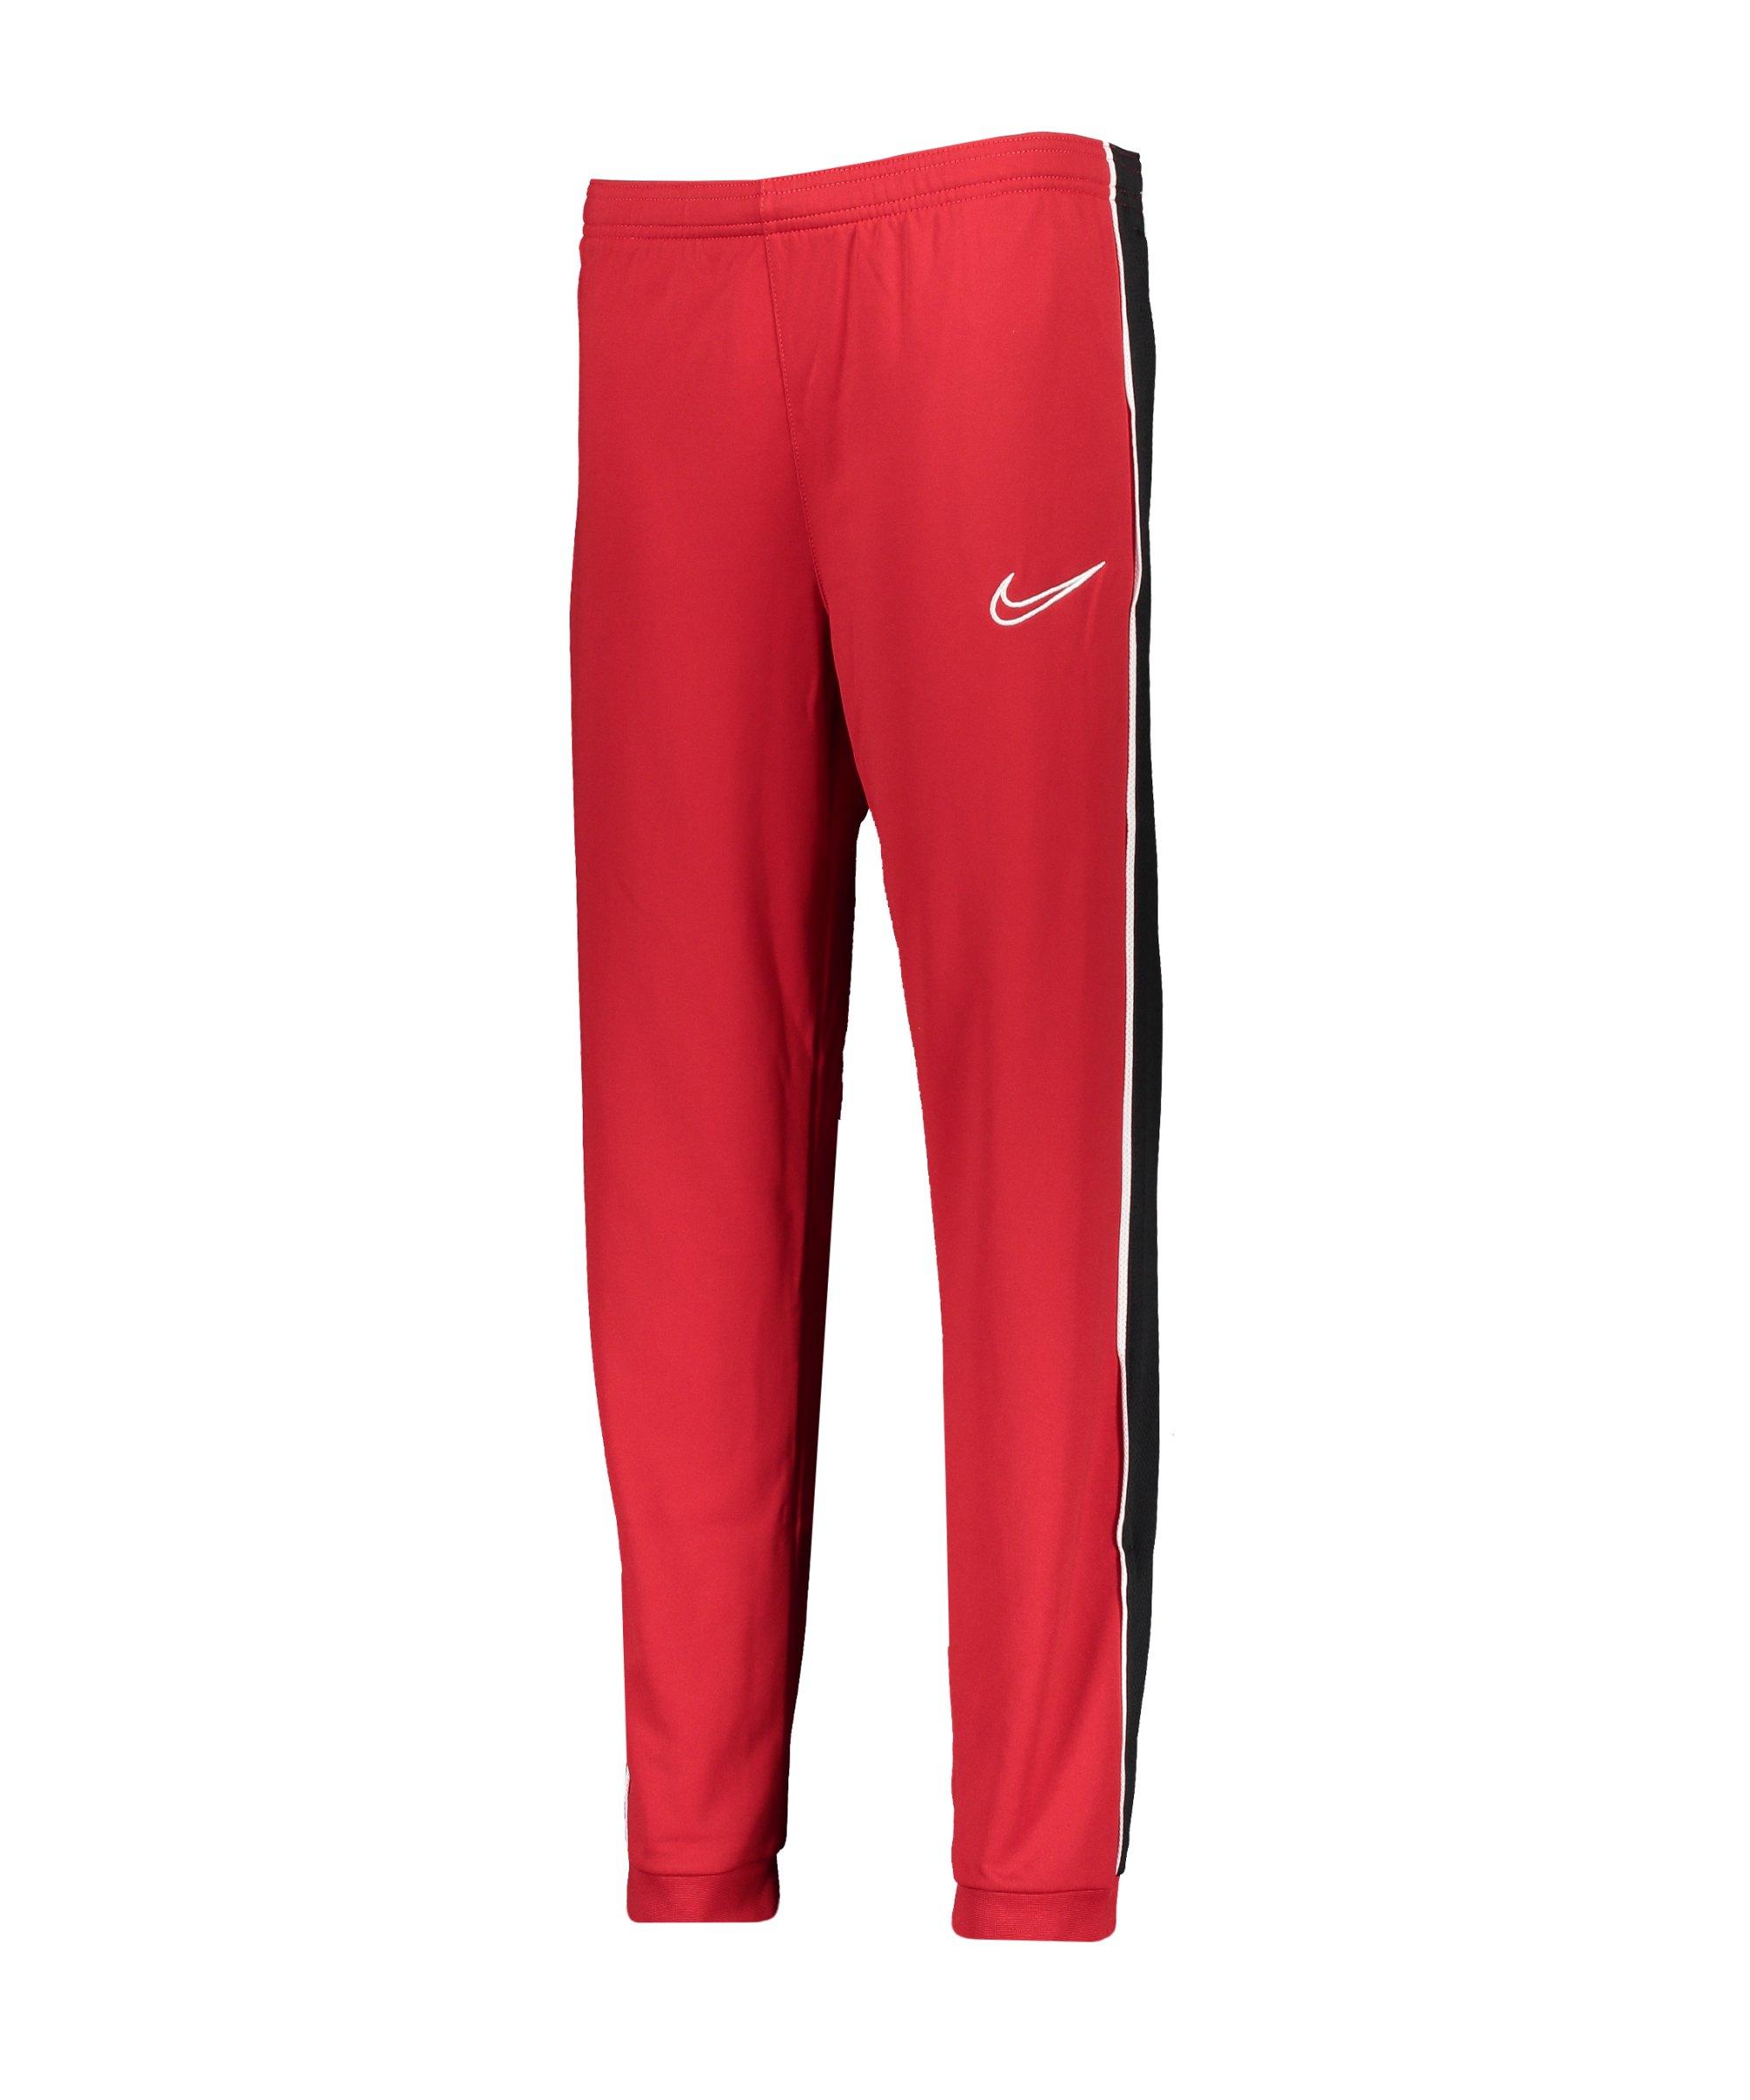 Nike Dry Academy Trainingshose Kids Rot F687 - rot